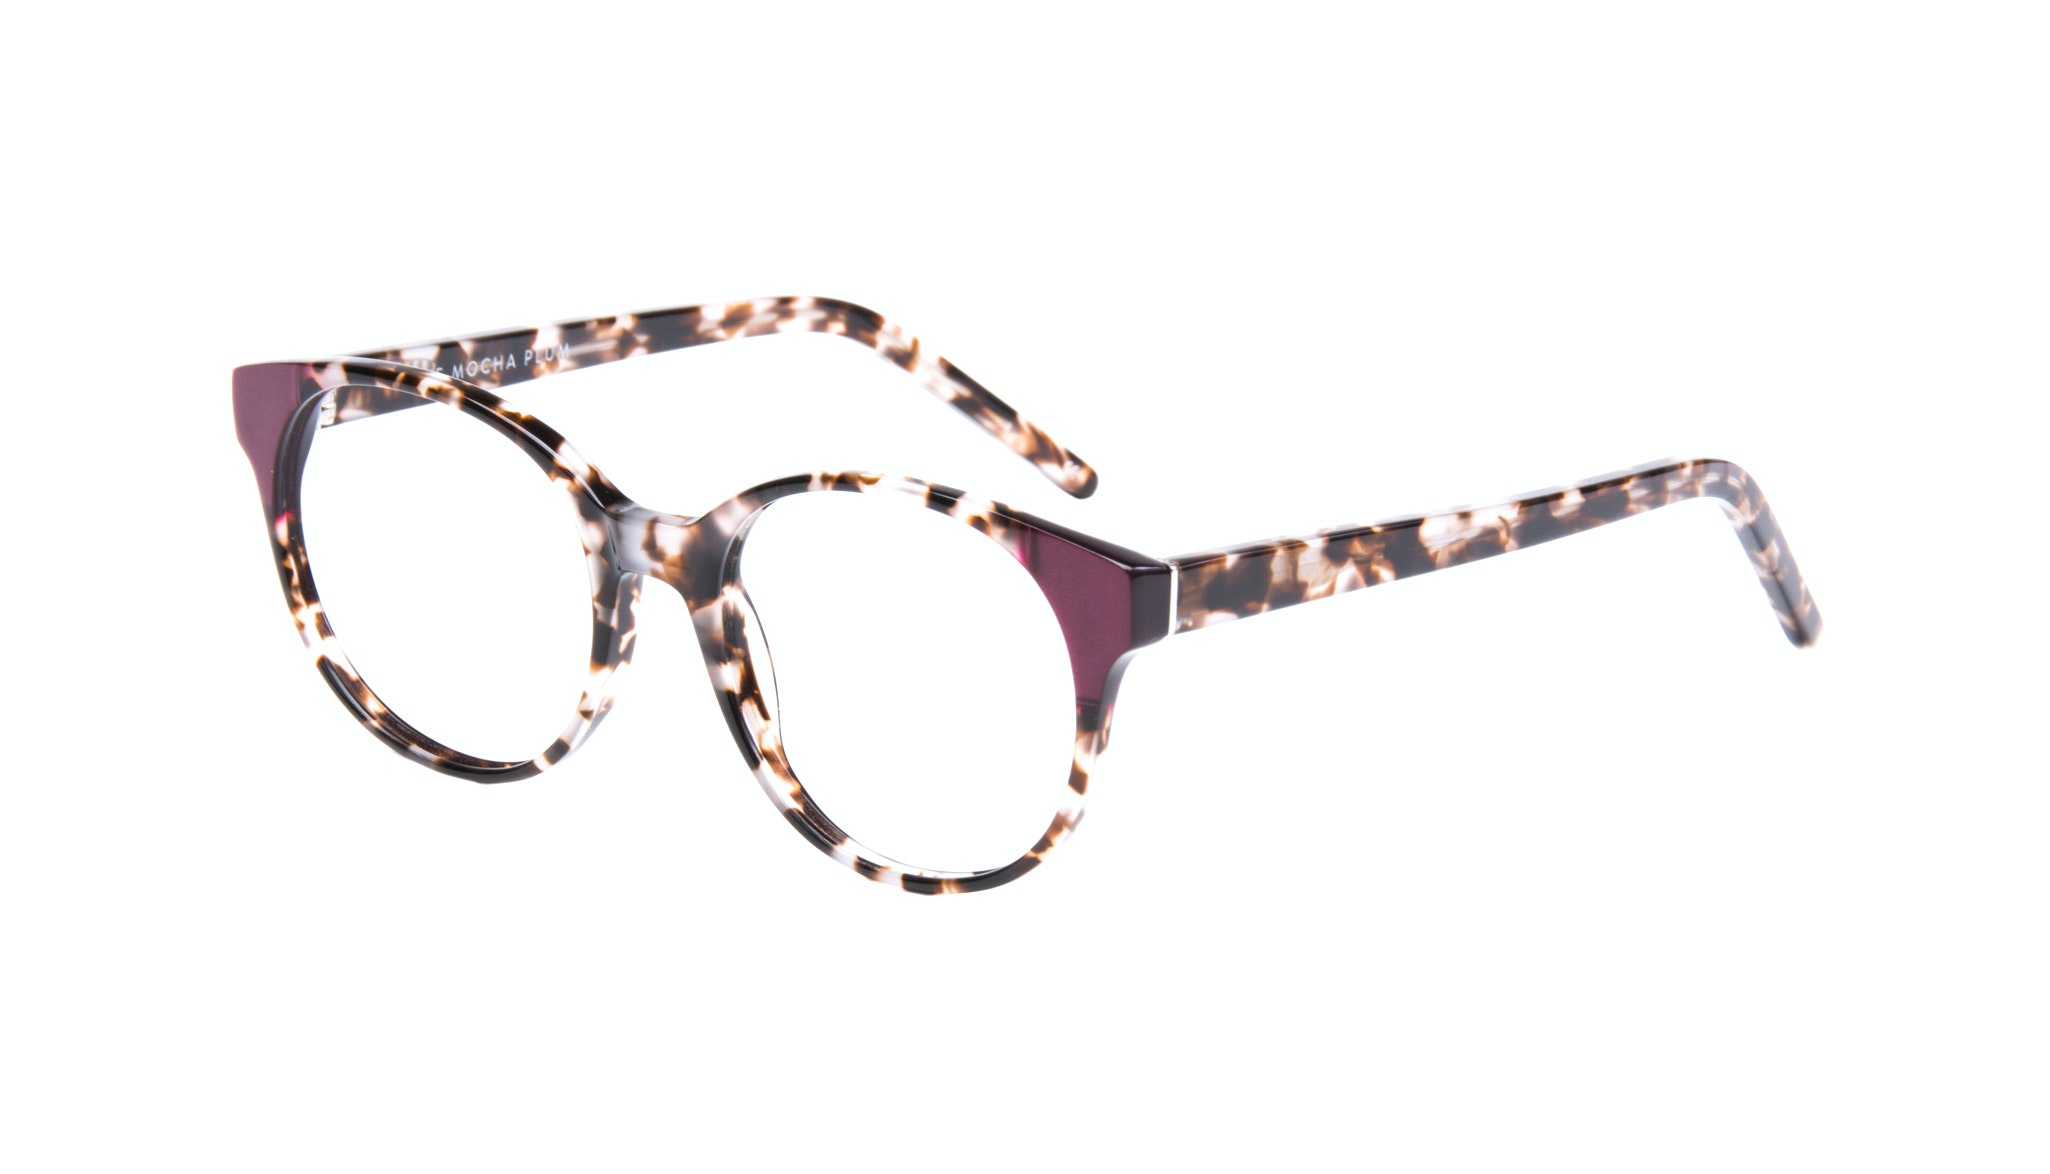 Affordable Fashion Glasses Round Eyeglasses Women Bis Mocha Plum Tilt